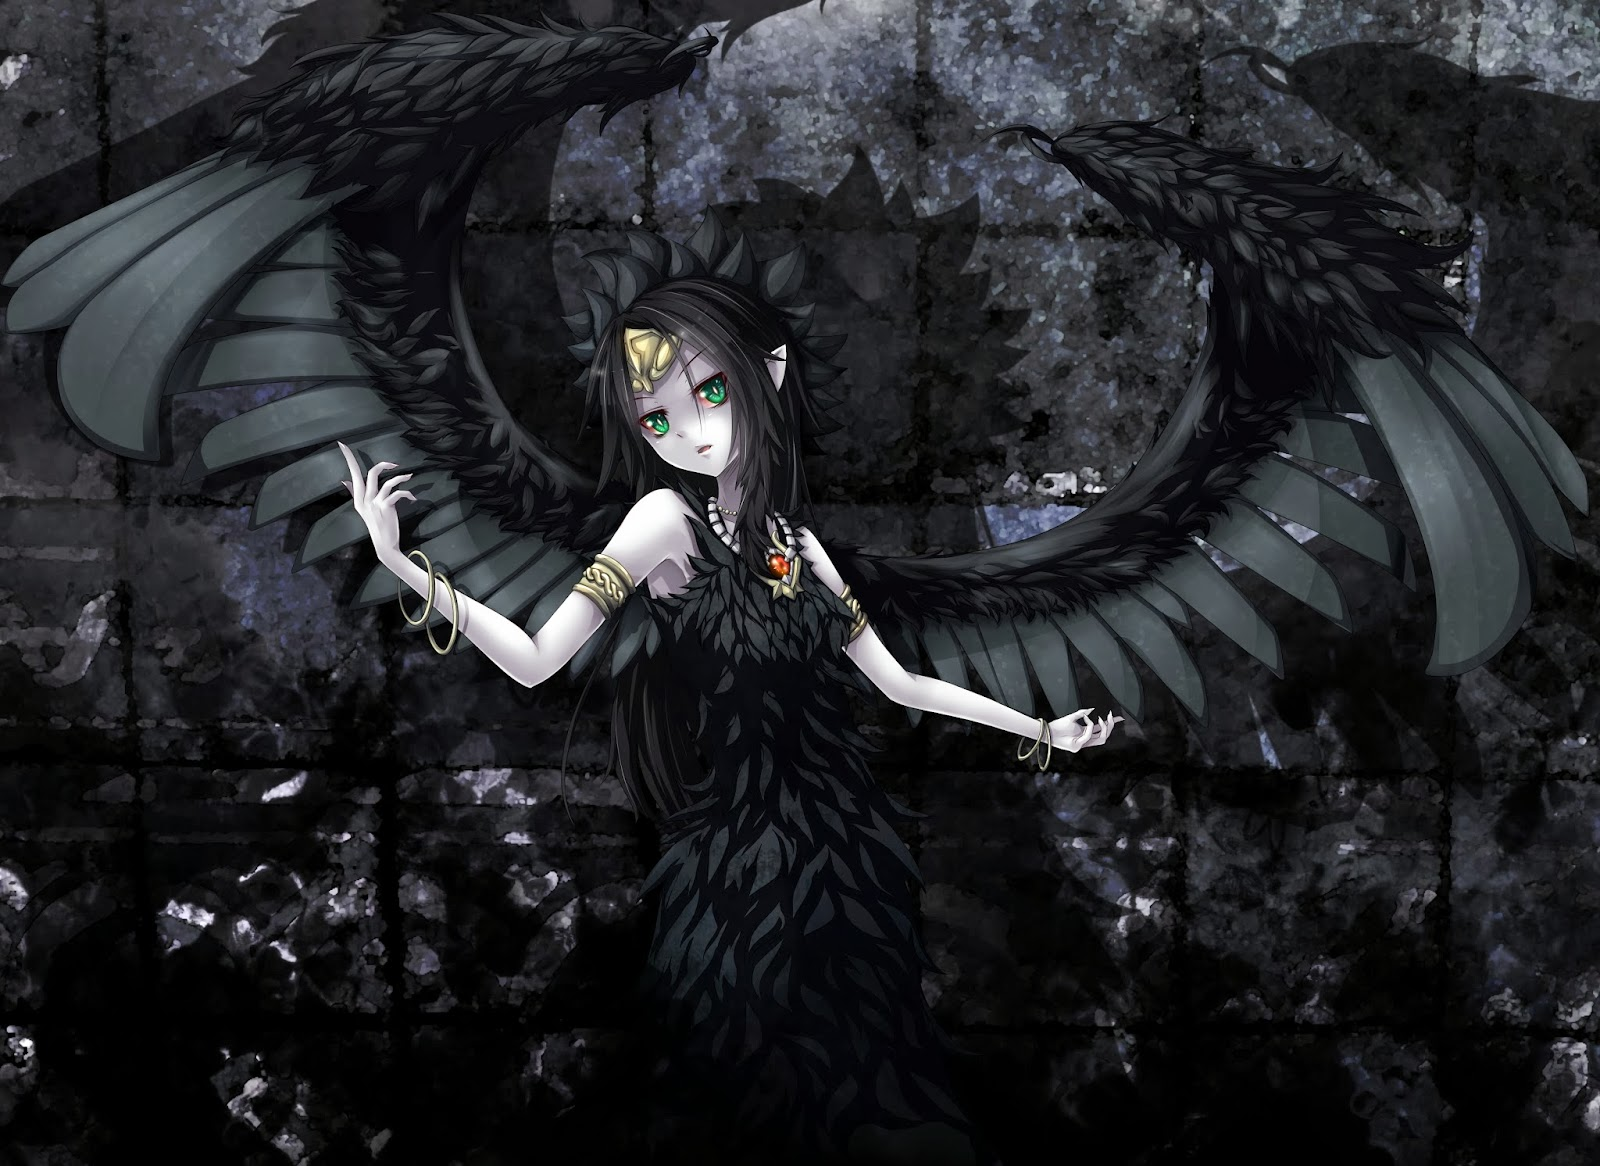 oscuro dark anime wallpaper: Alice´s Fashion: Nuevo Proyecto / New Project